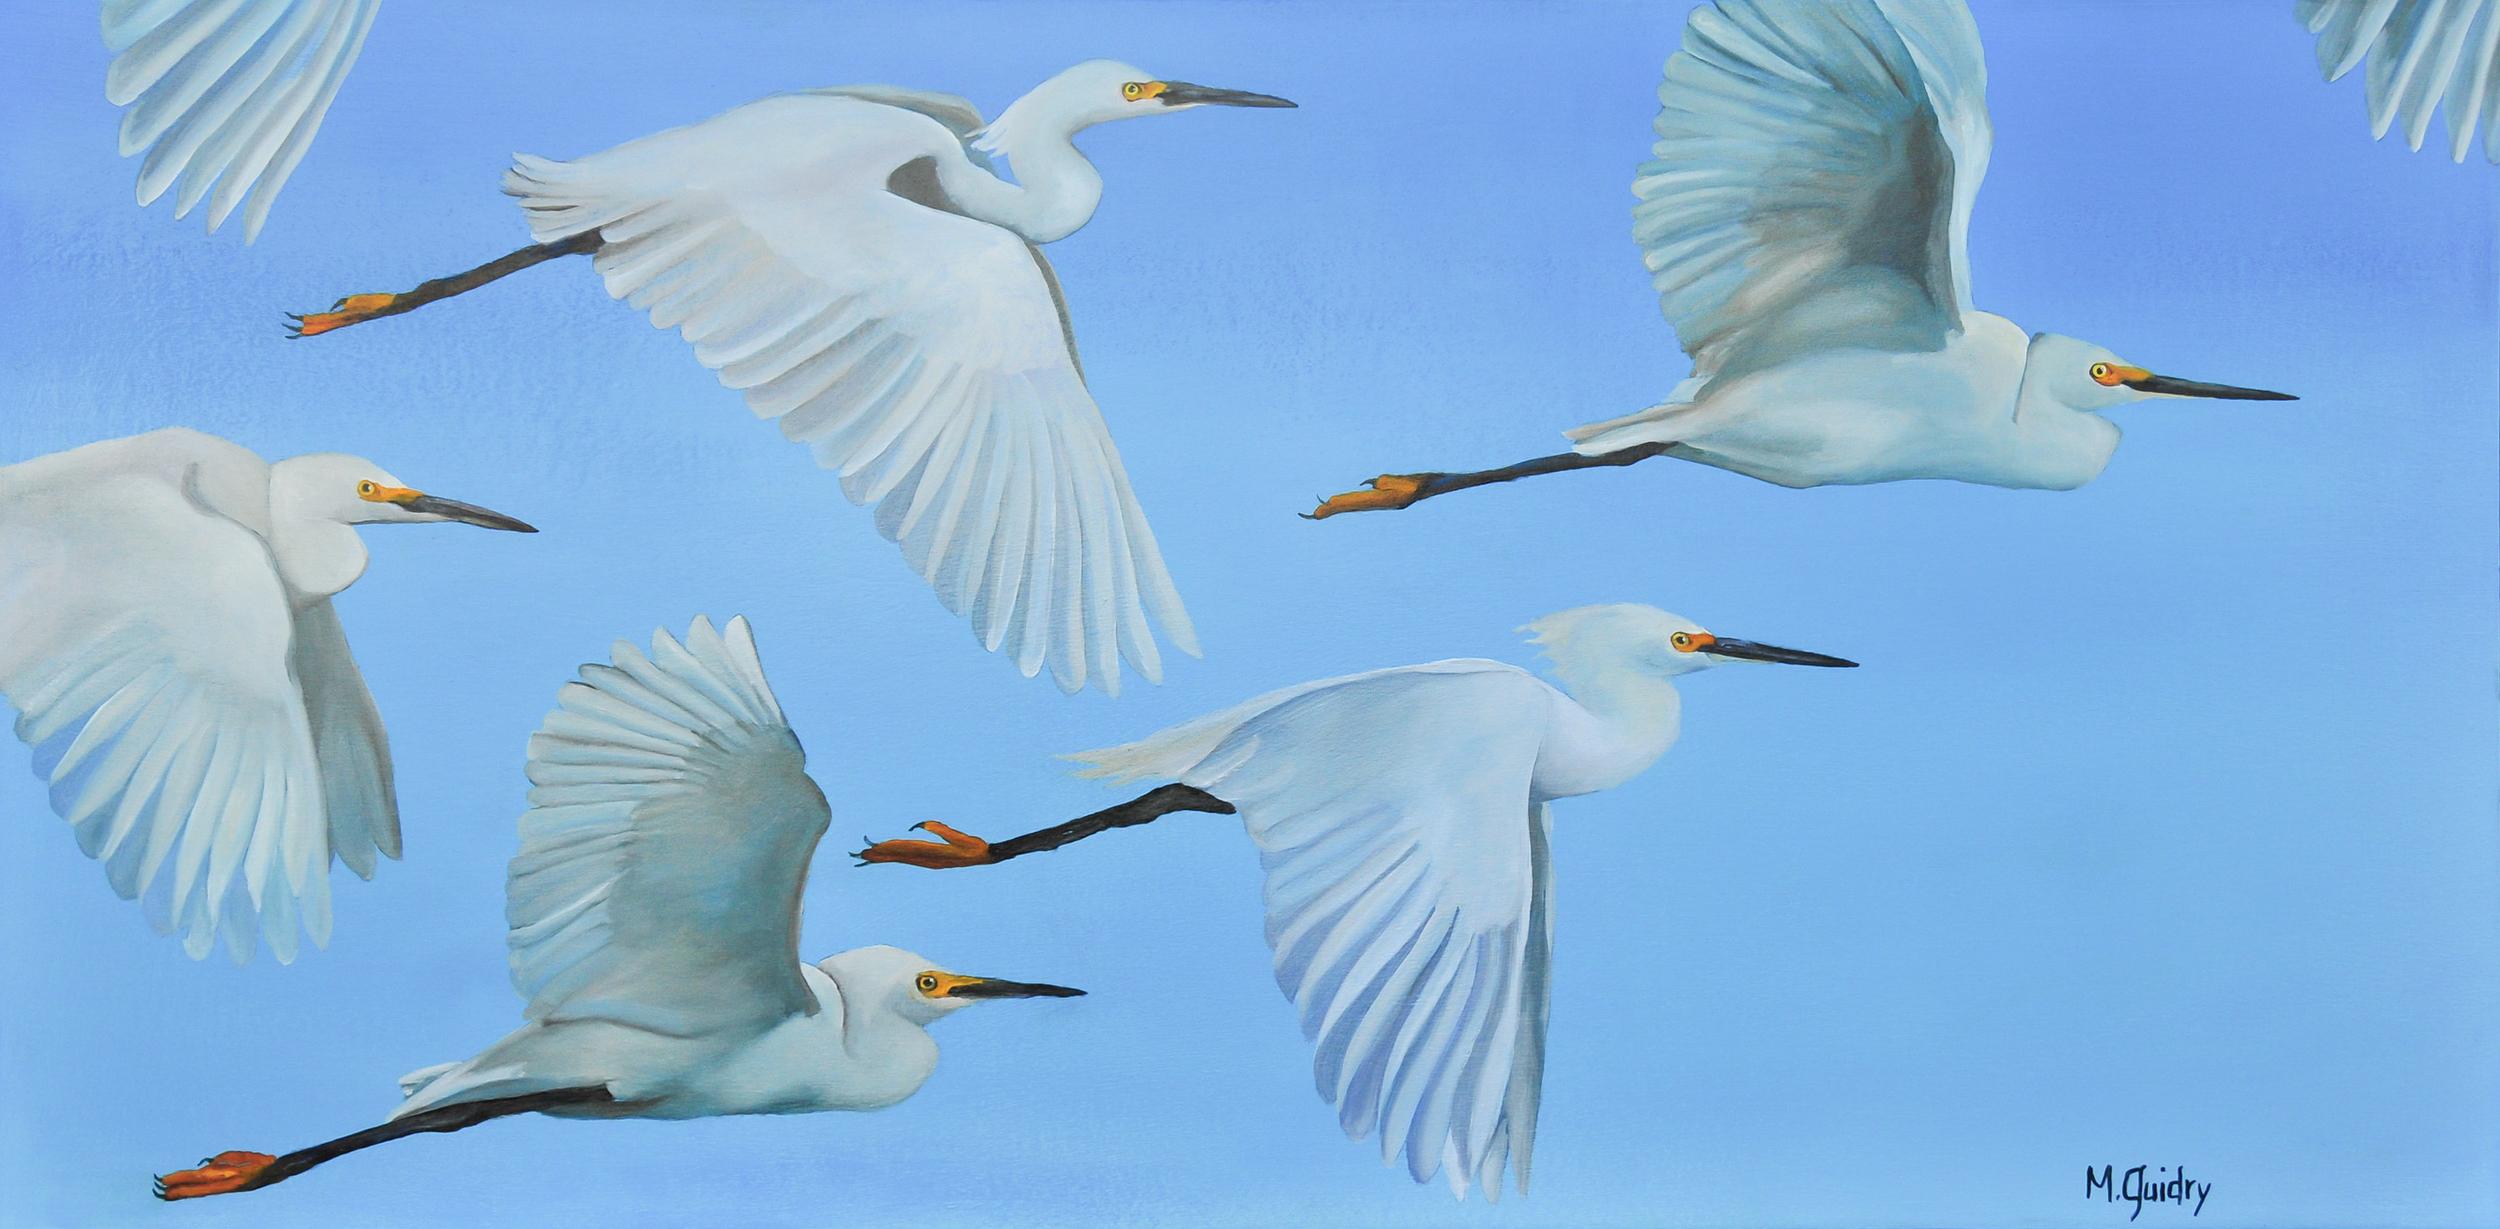 snowy_egrets_flock_louisiana_m.guidry_michael_guidry_oil_painting_marsh_new_orleans_artist.jpg